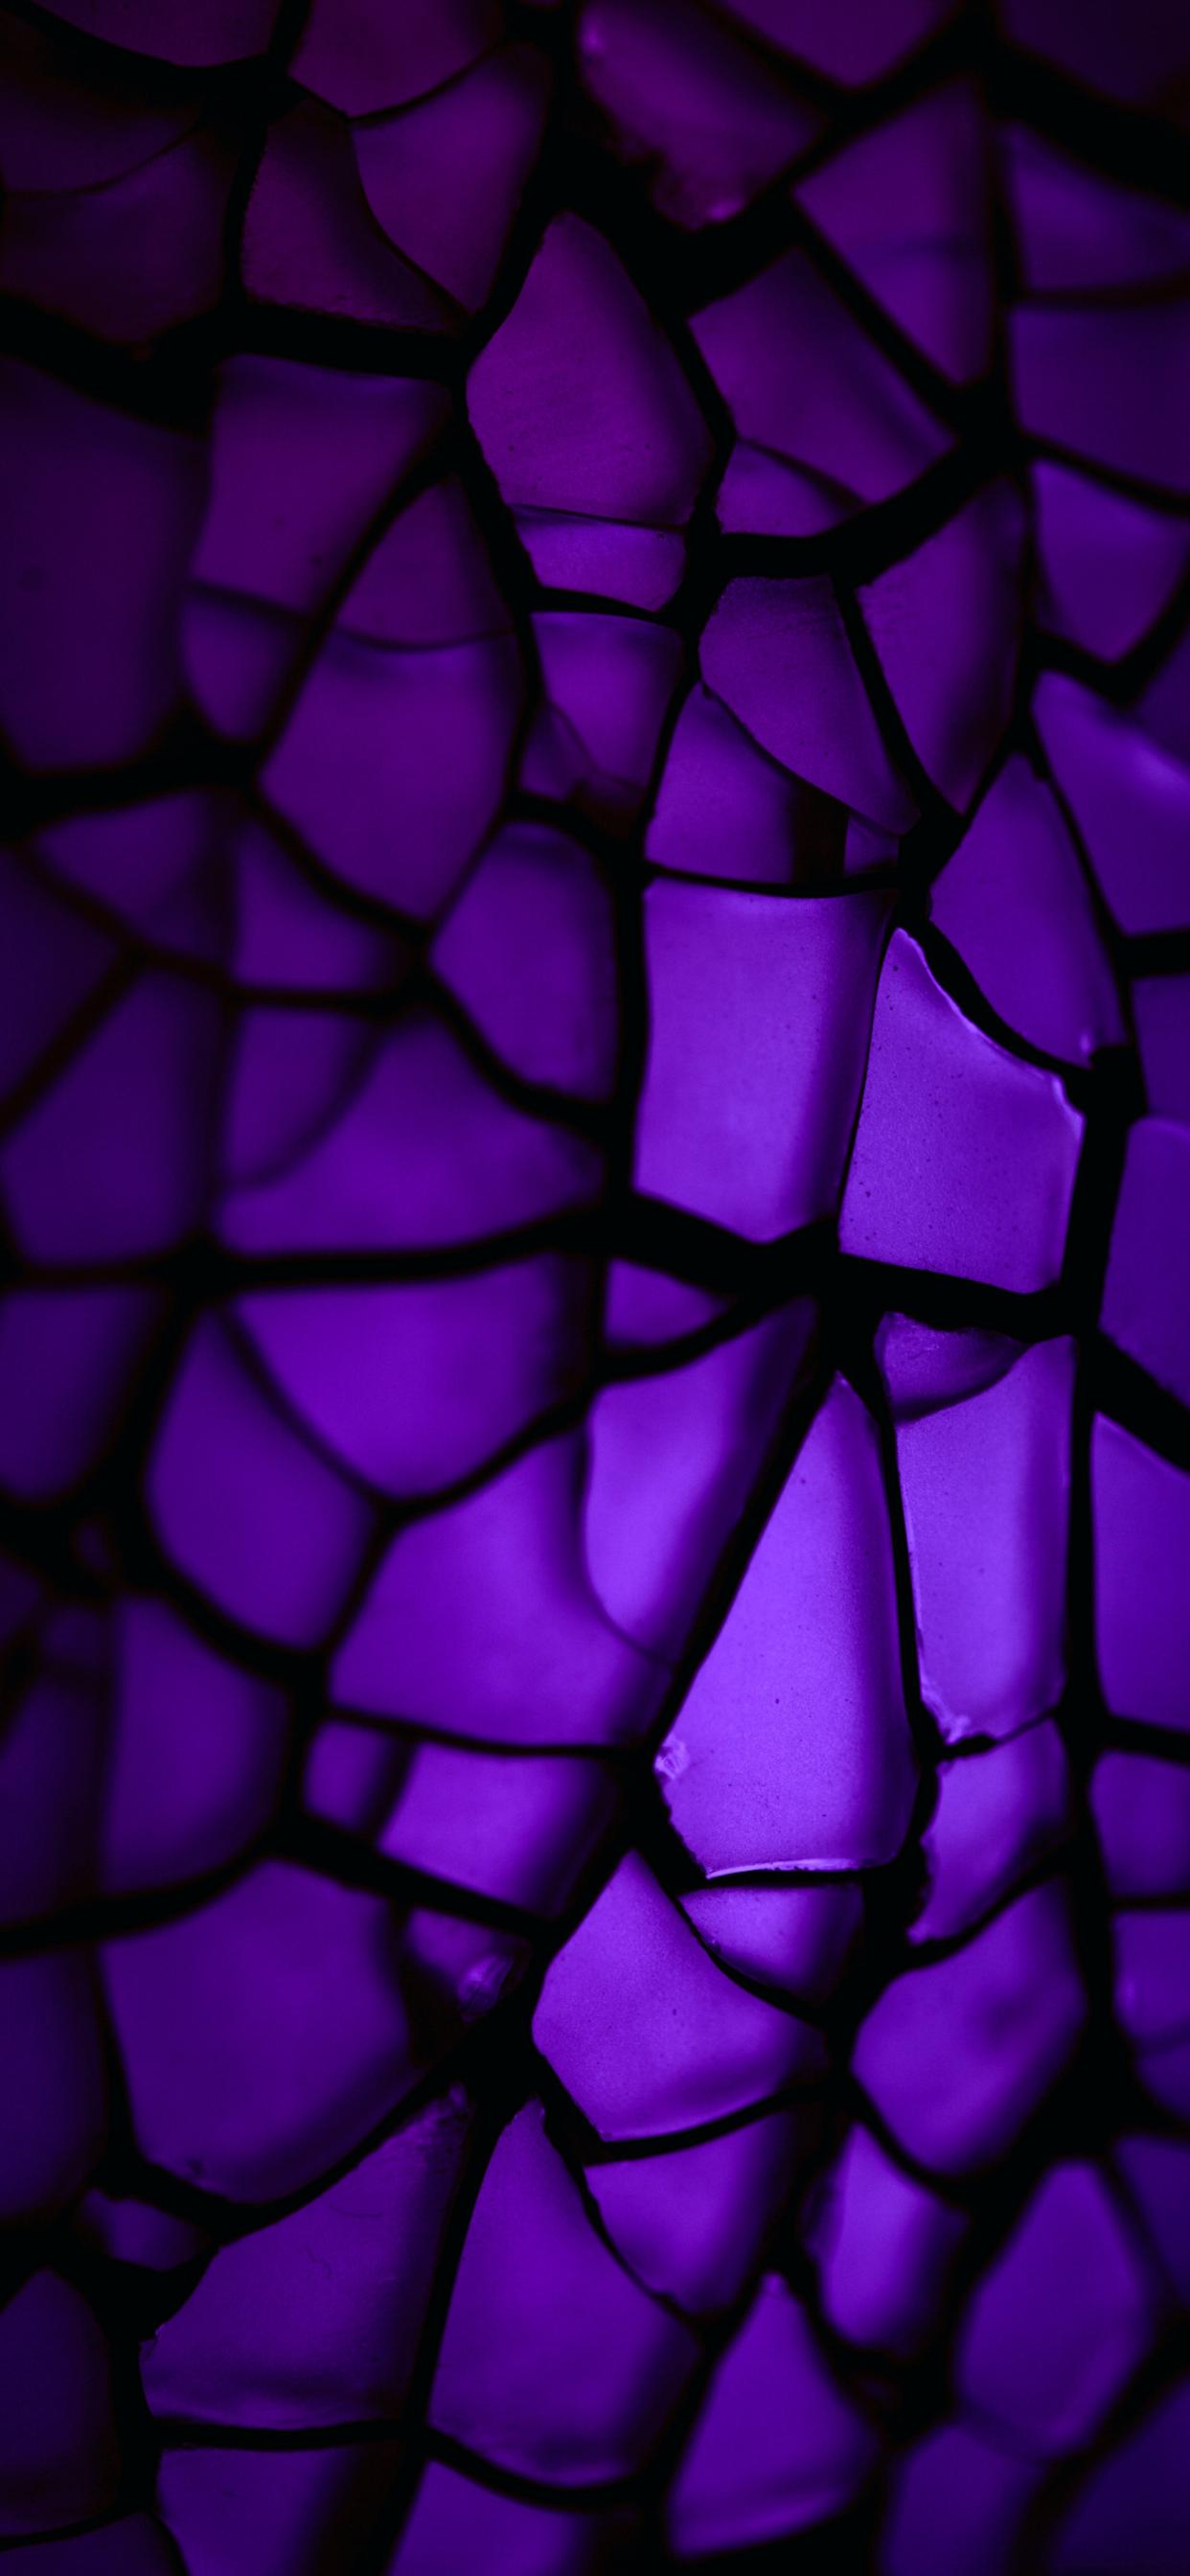 iPhone wallpapers abstract glass dark purple Fonds d'écran iPhone du 28/01/2020